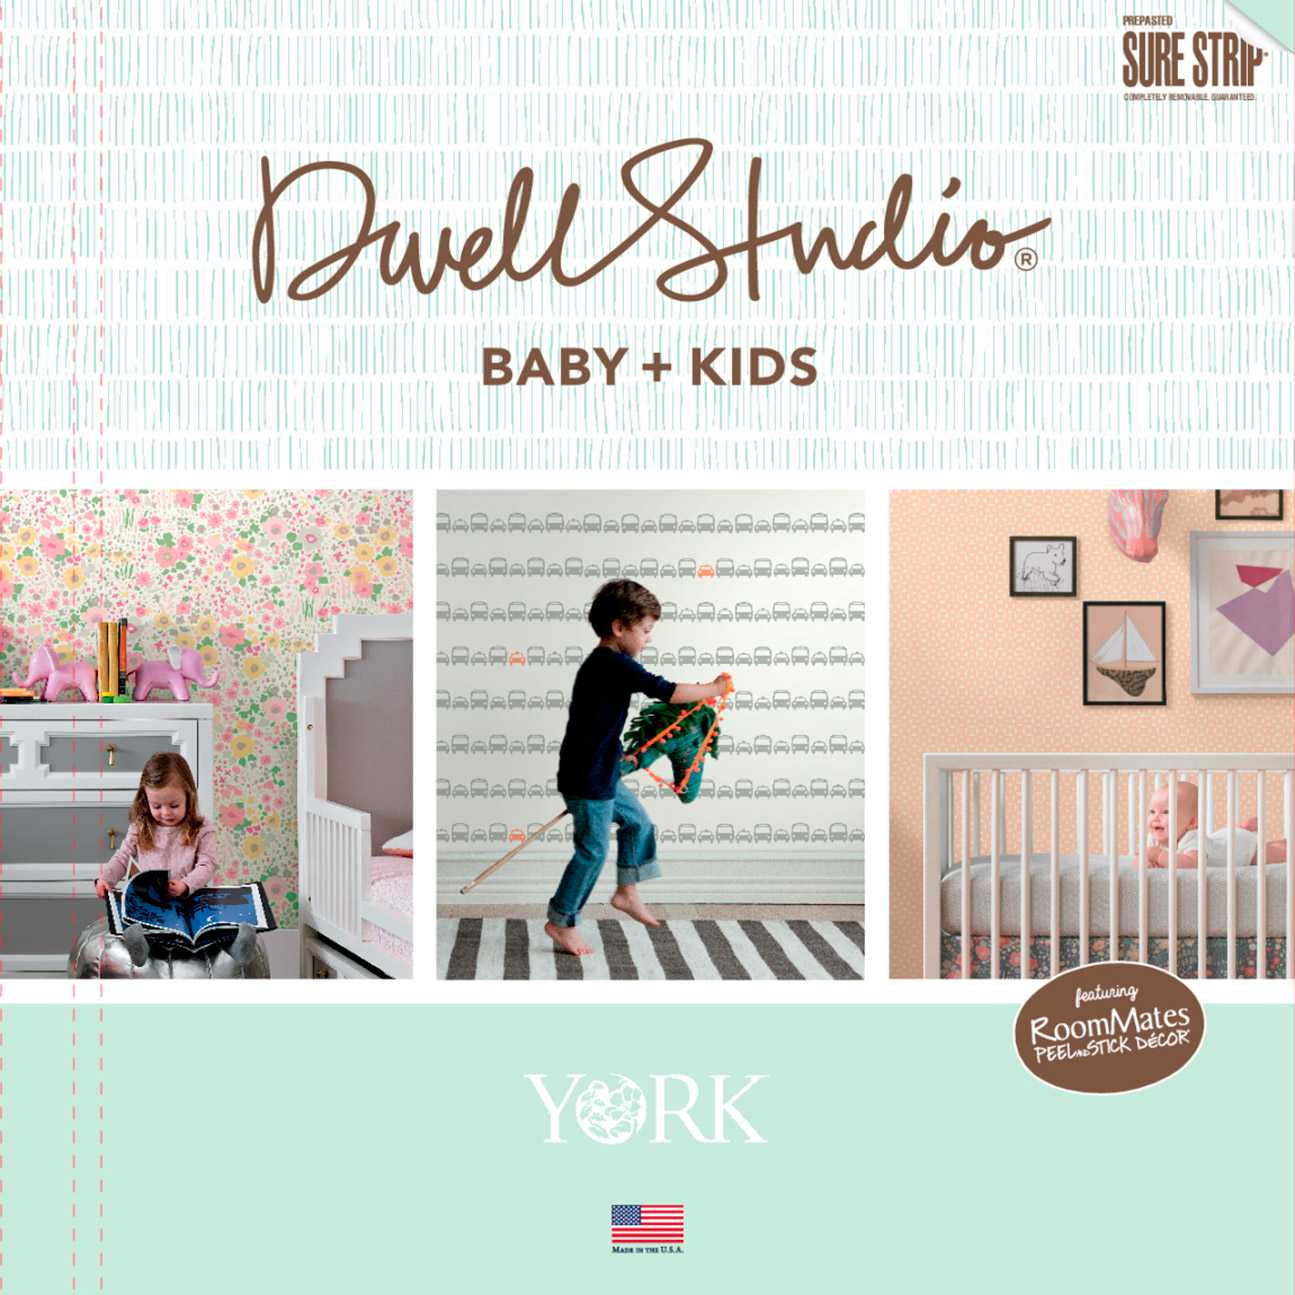 Dwell Studio Baby + Kids